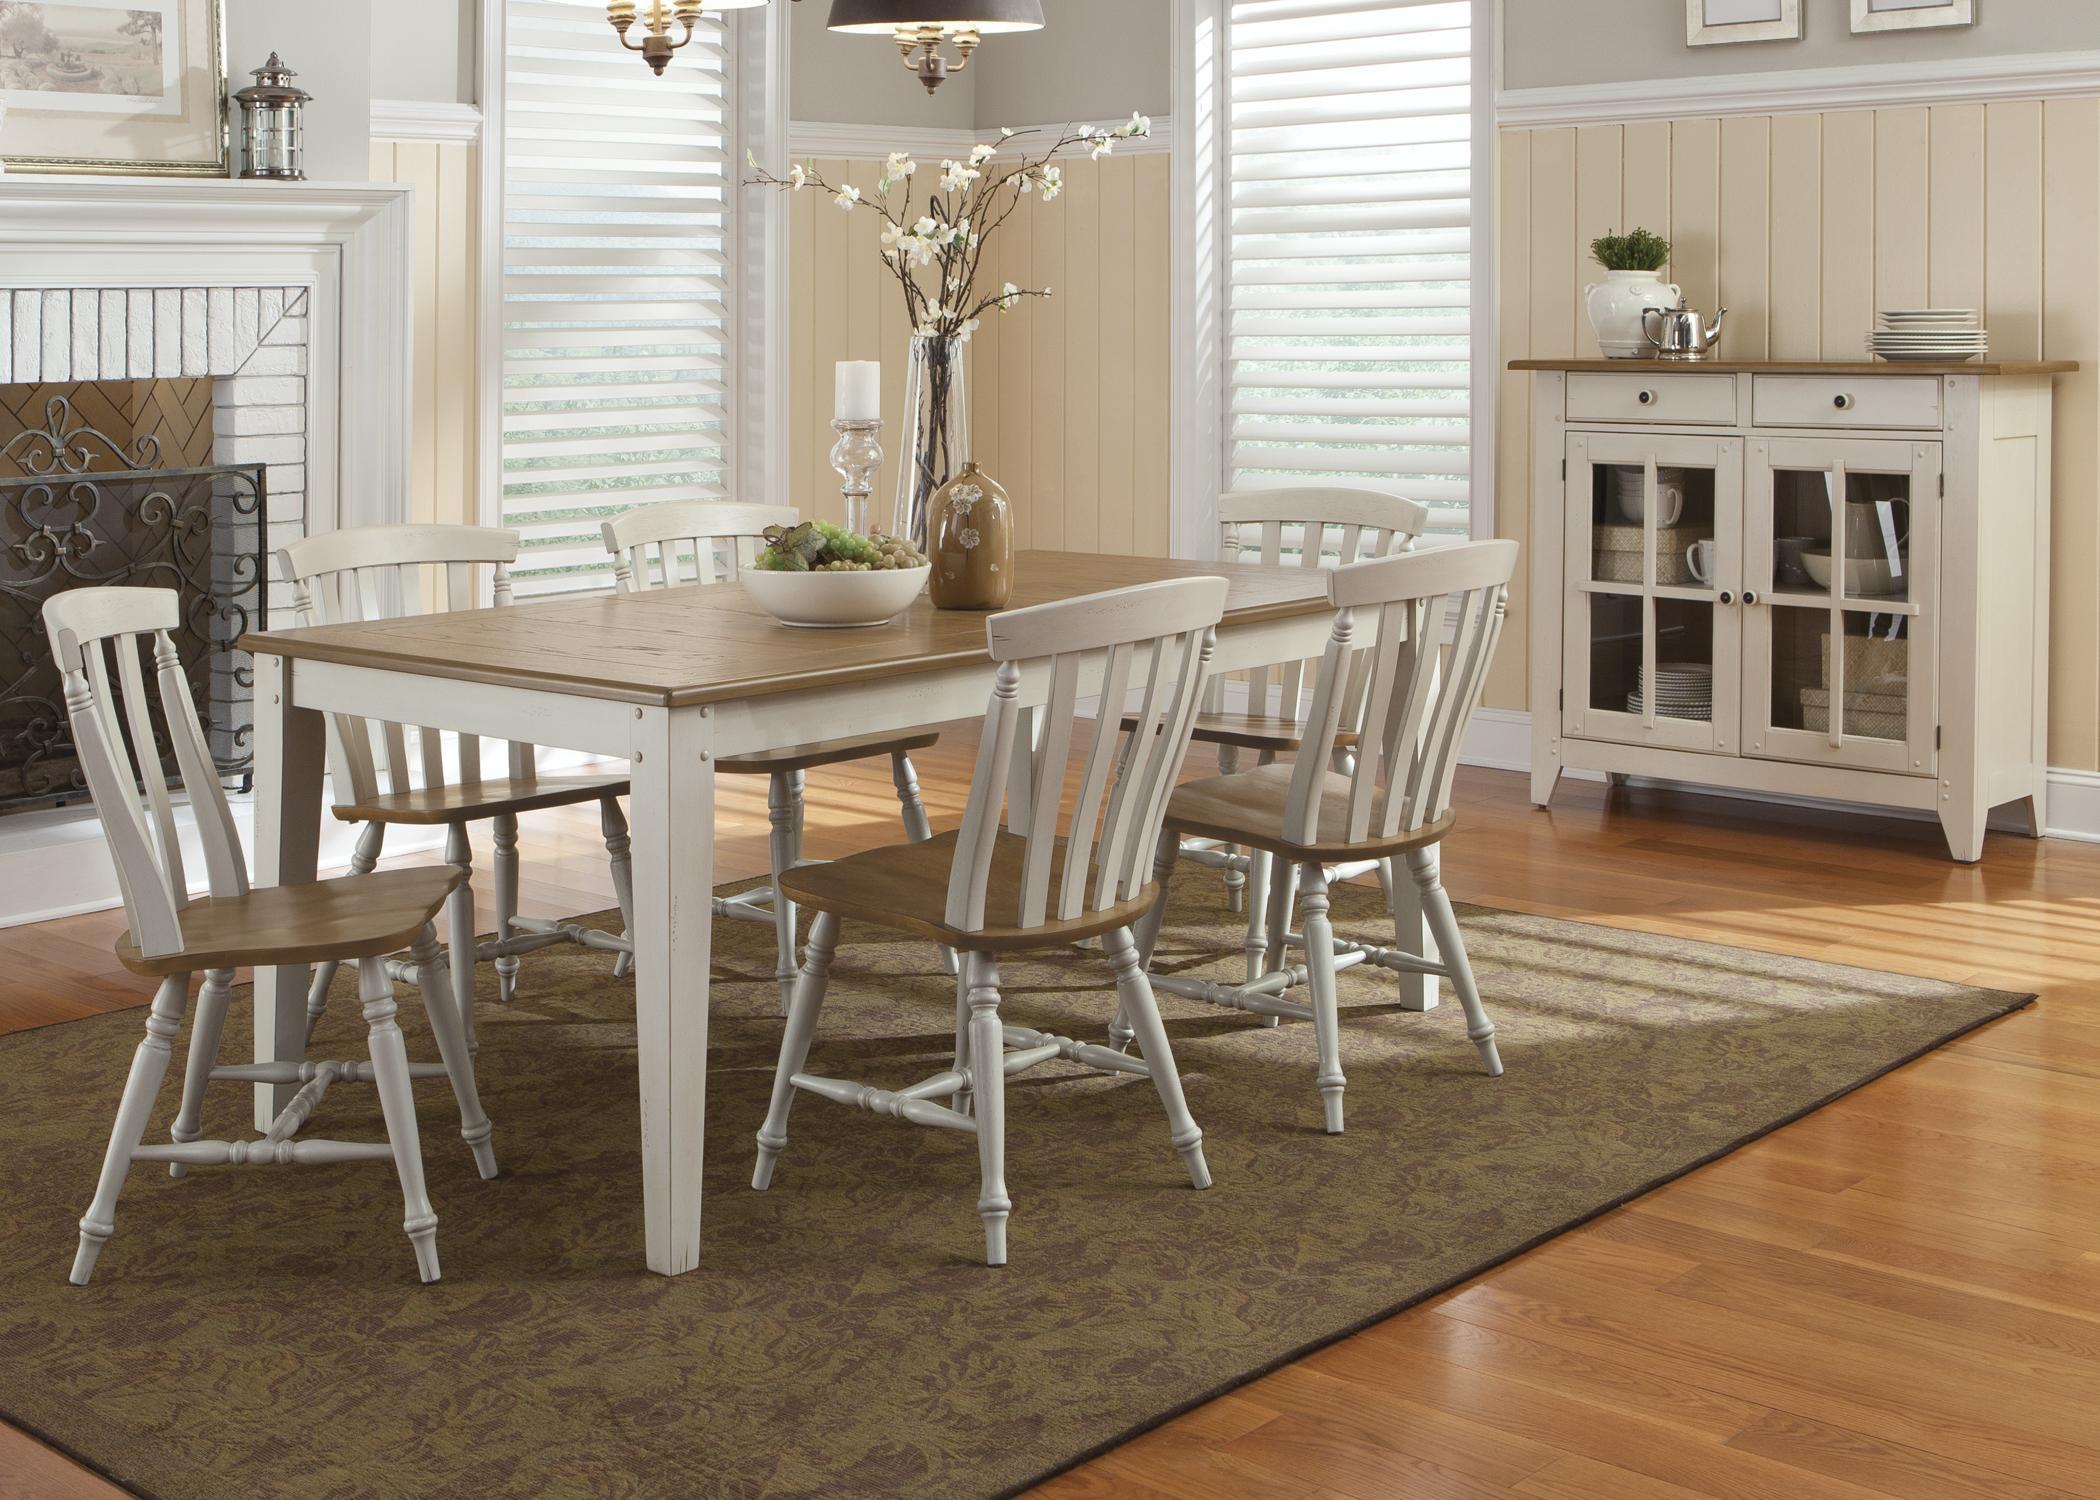 Liberty Furniture Al Fresco III Round Drop Leaf Dining Leg Table